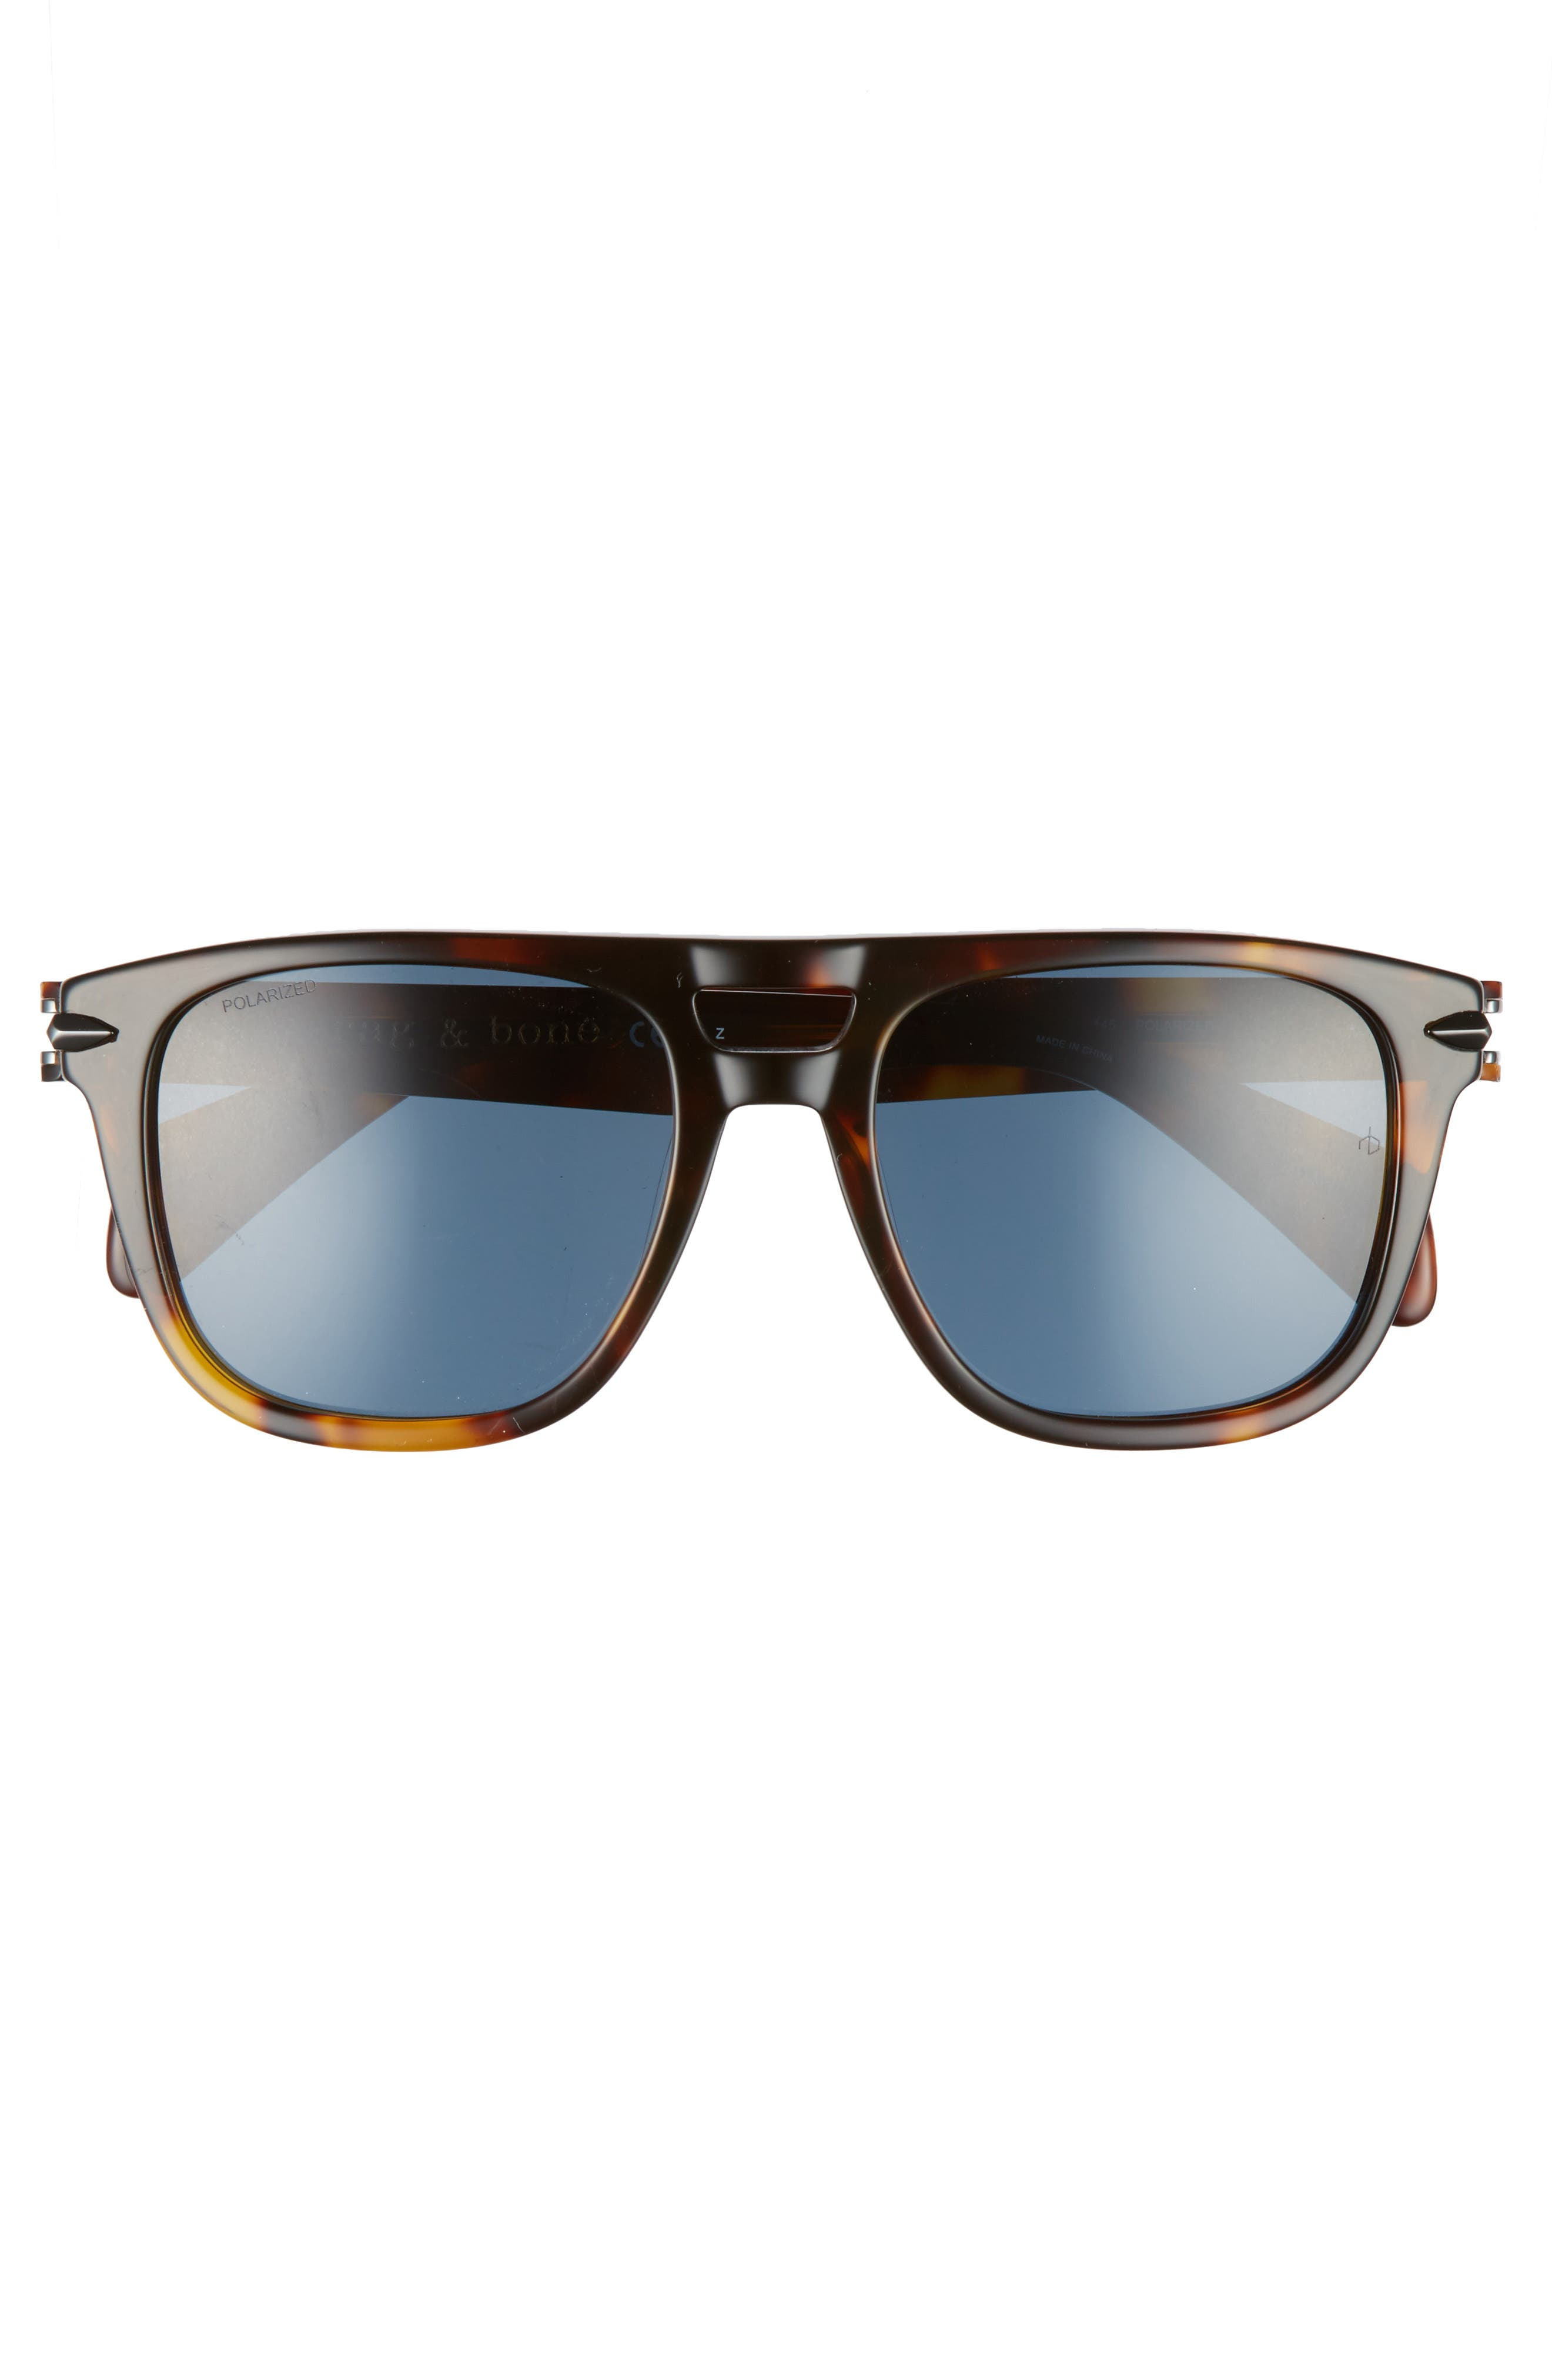 53mm Polarized Sunglasses,                             Alternate thumbnail 2, color,                             Dark Havana Polar